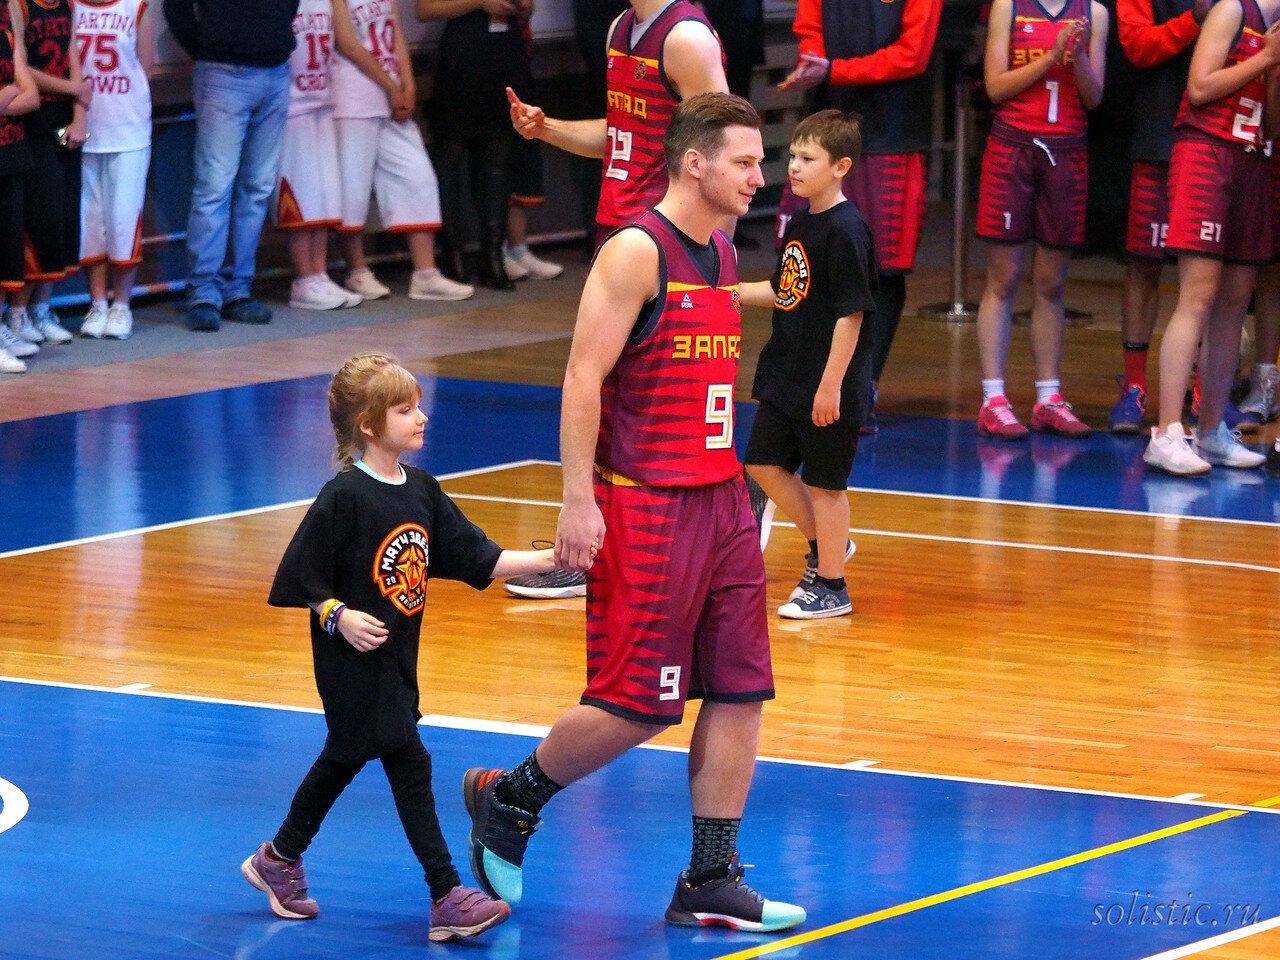 44 Матч звезд АСБ 2018 (ассоциации студенческого баскетбола)